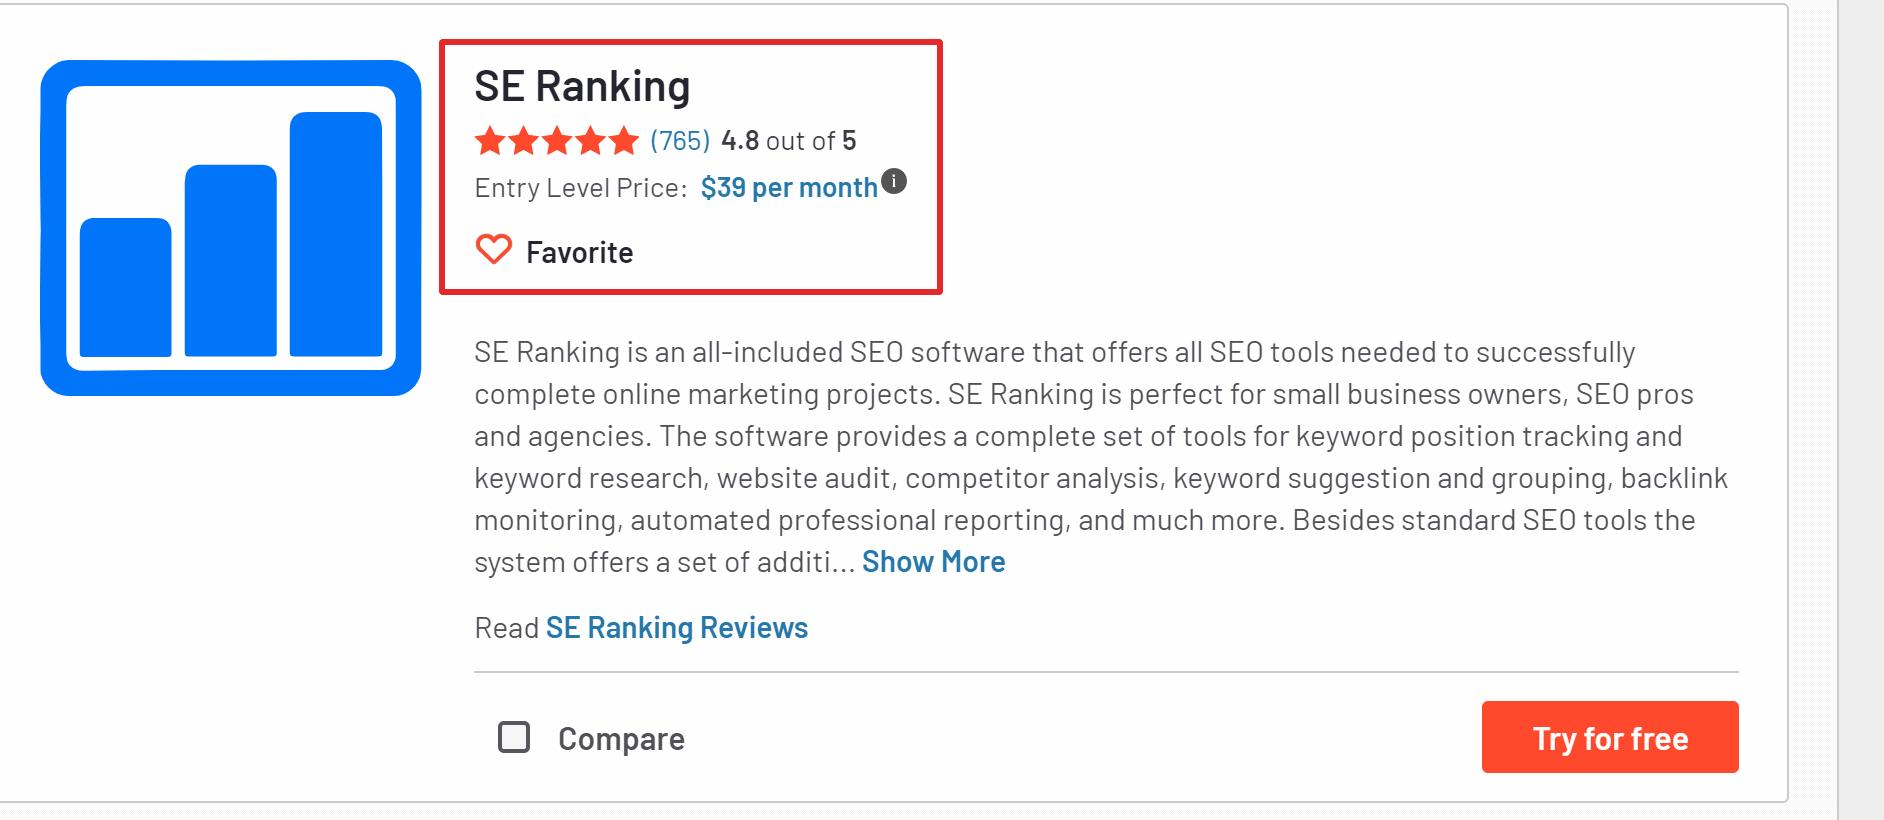 G2 ranking SE ranking